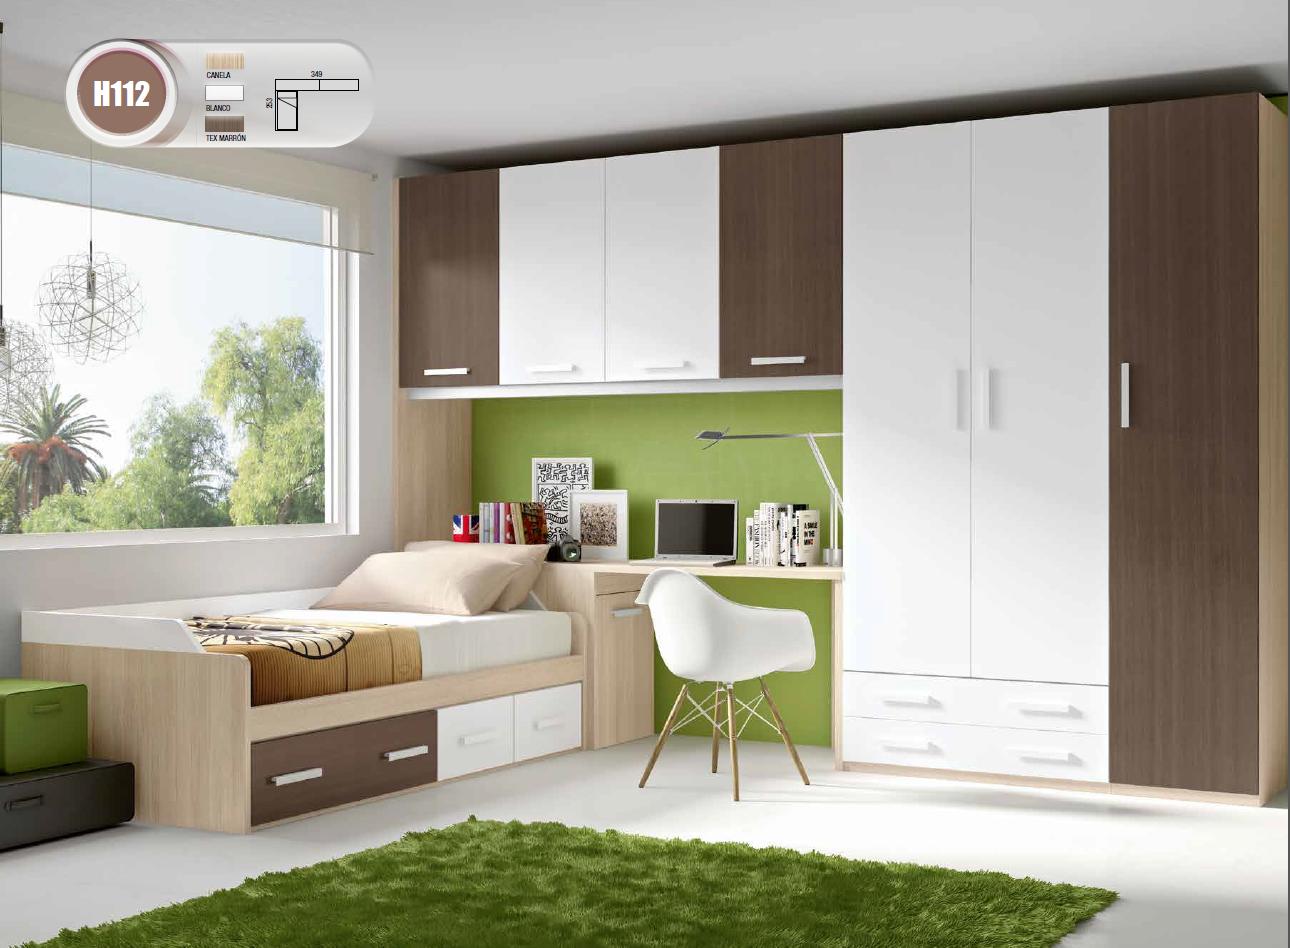 Dormitorios juveniles b sic de glicerio chaves mobles - Decoracion de dormitorios juveniles pequenos ...